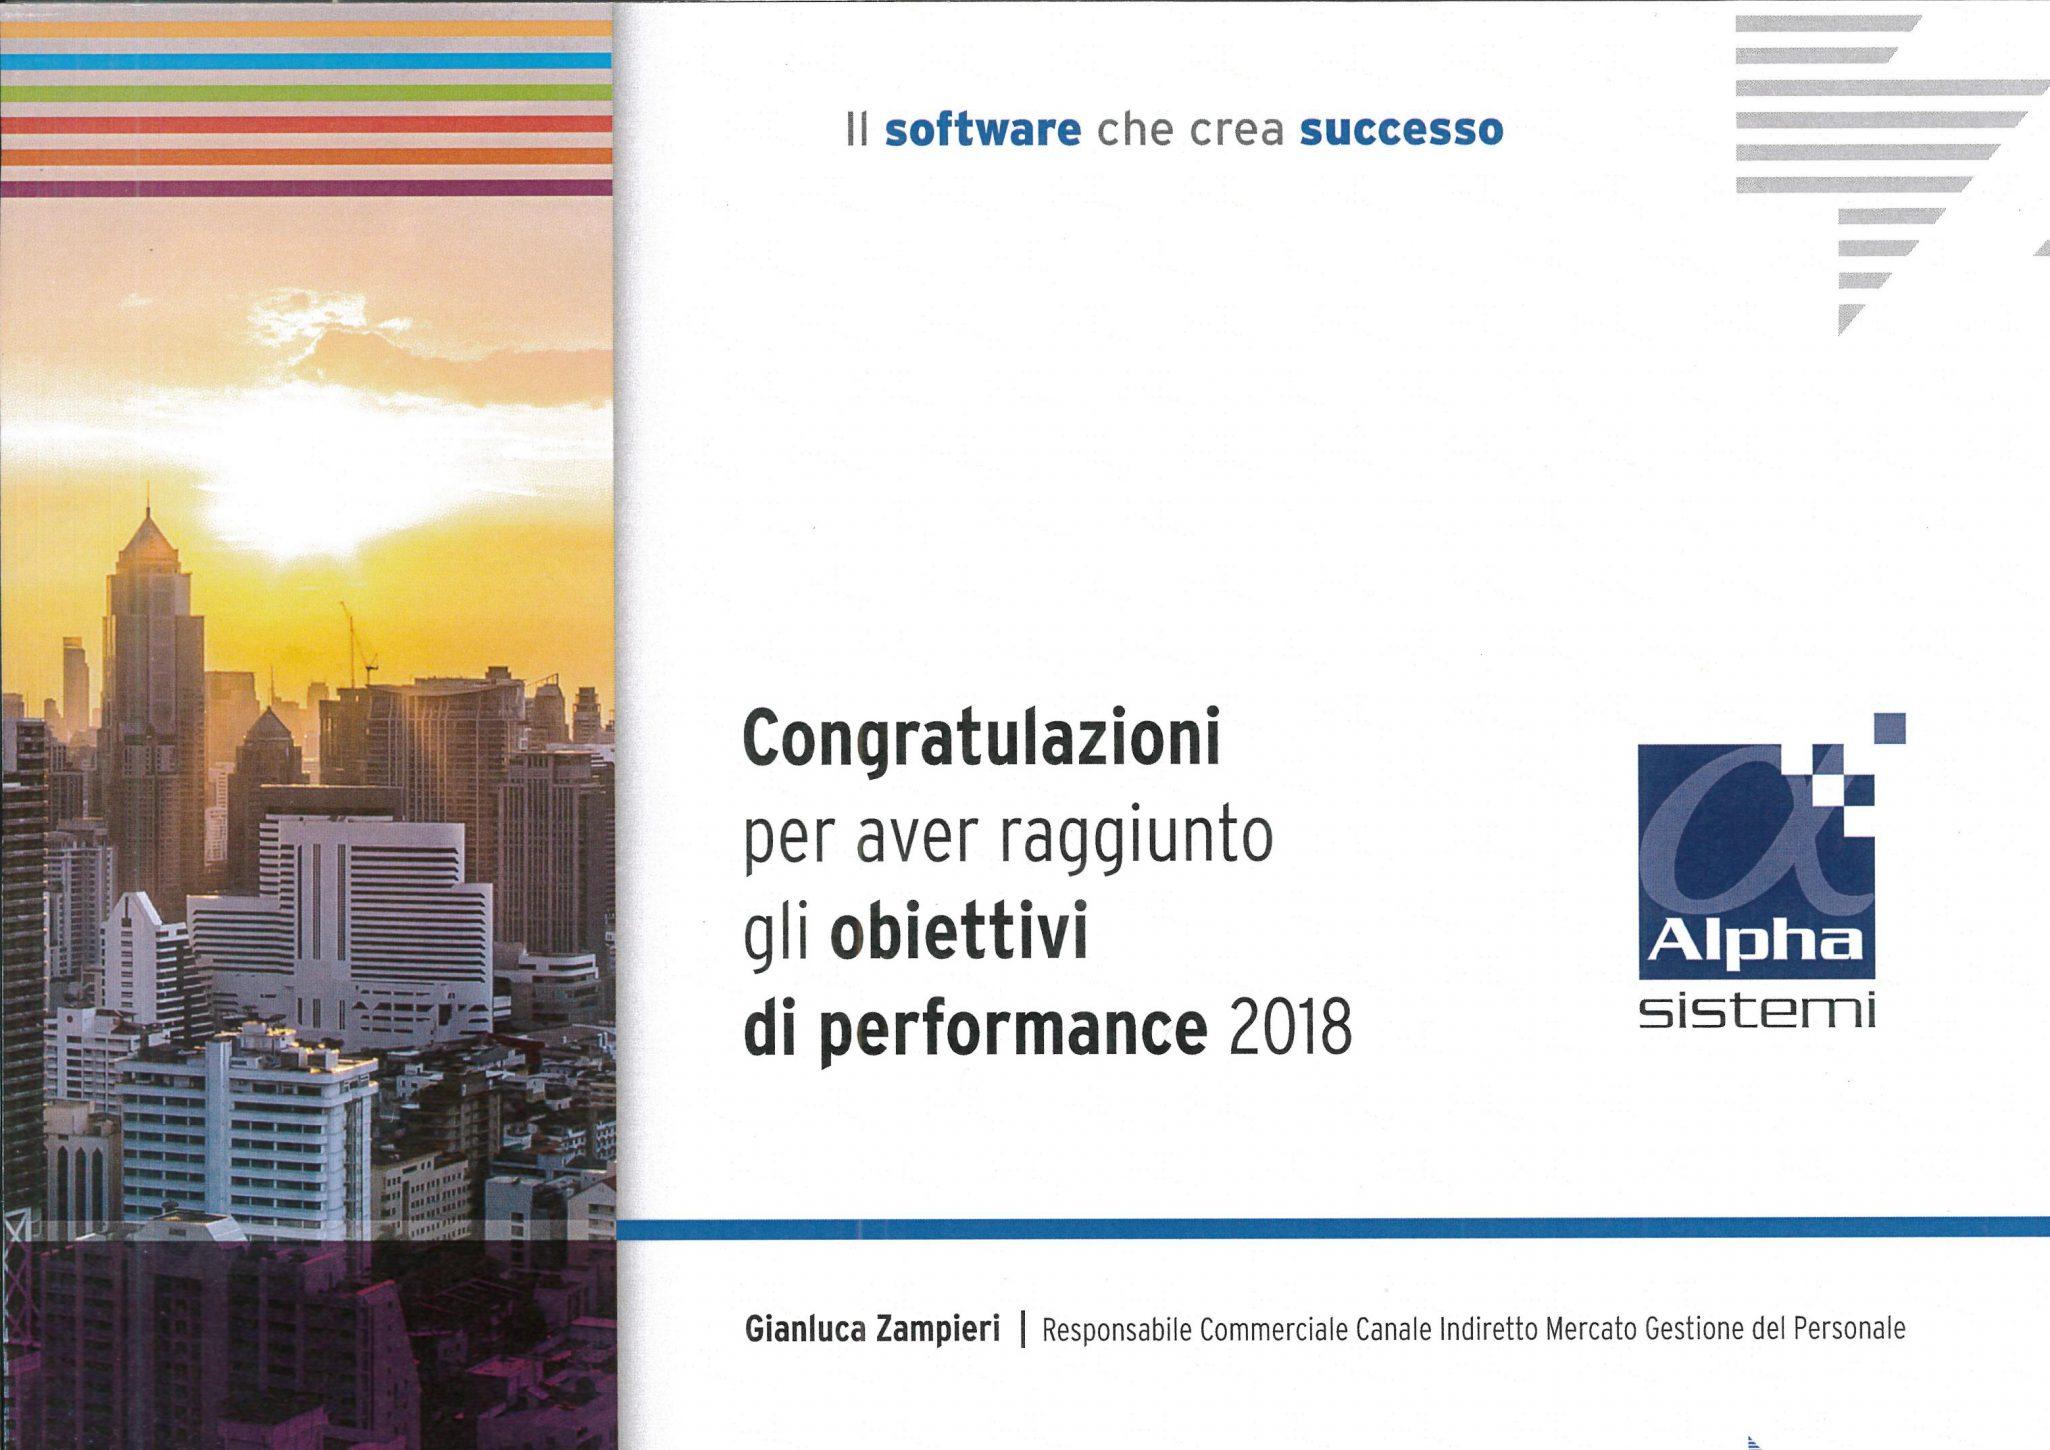 Obiettivi di performance 2018